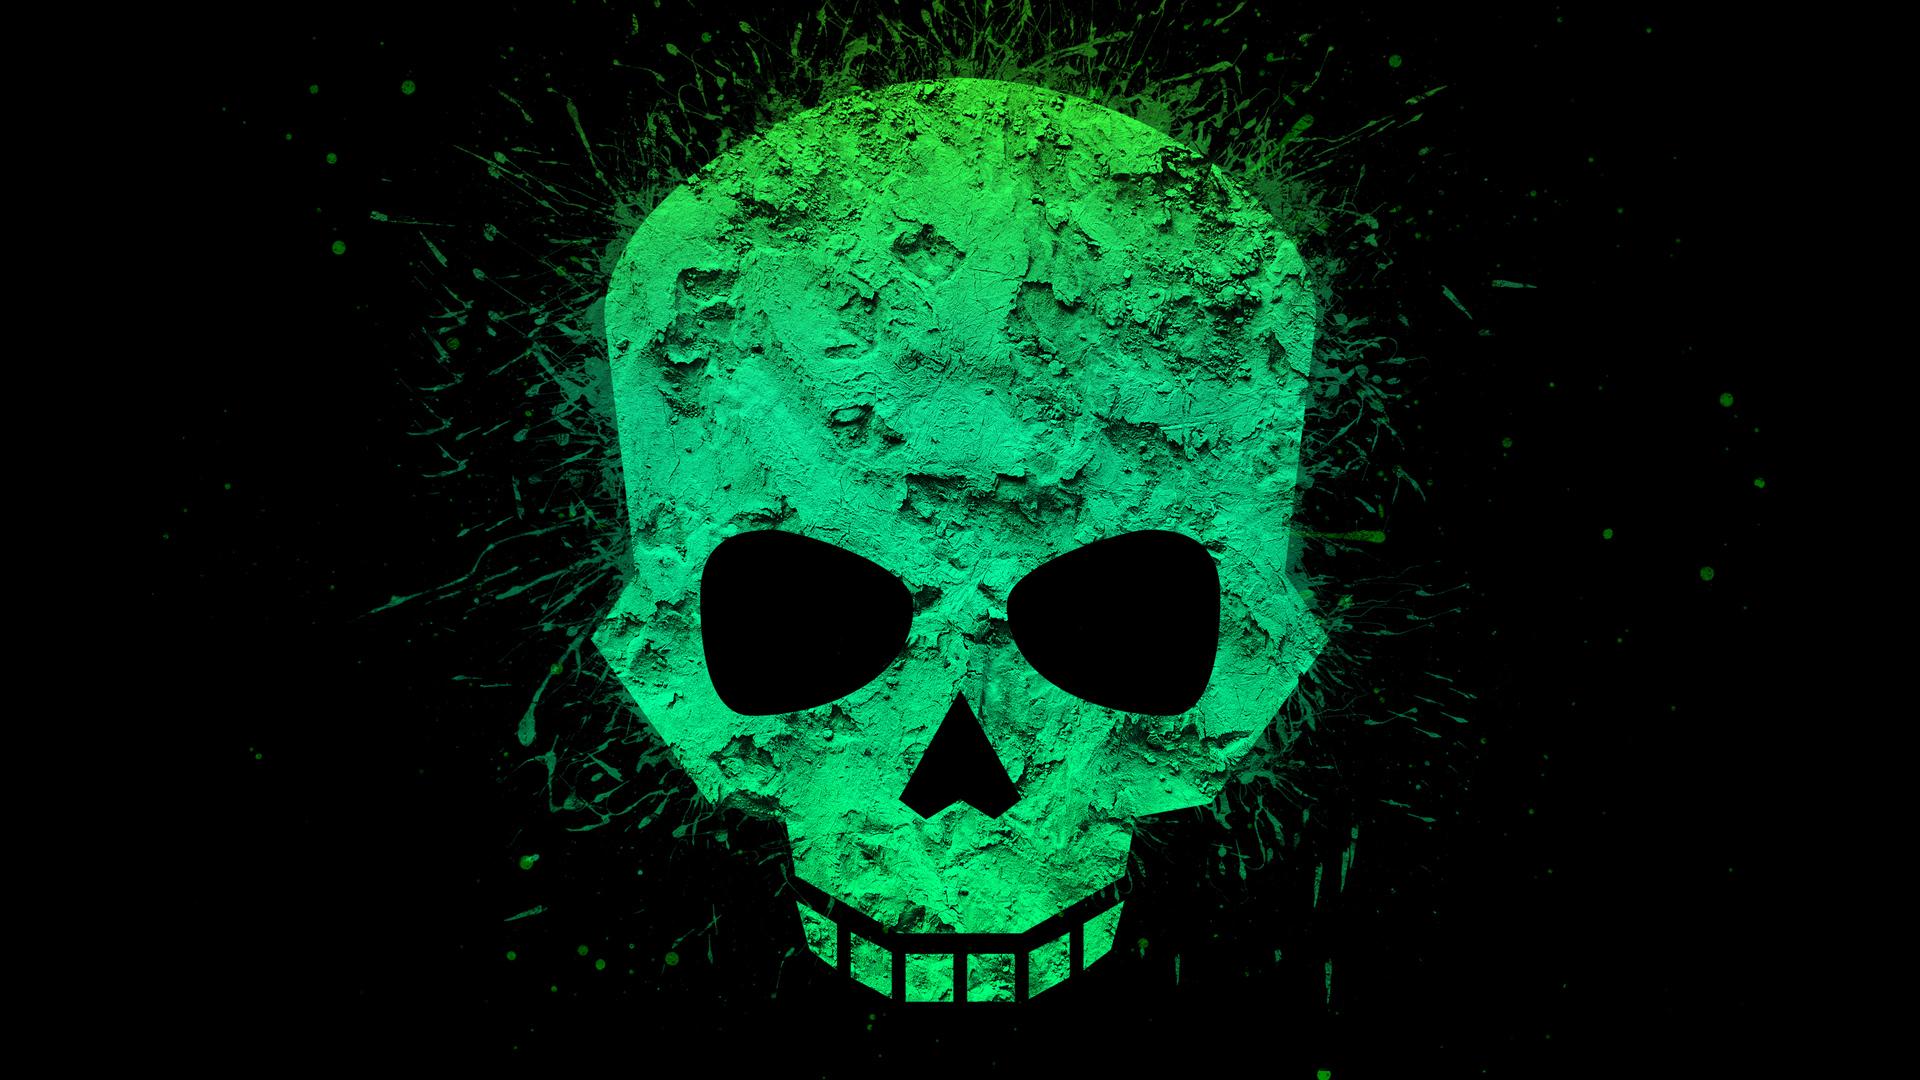 1920x1080 Green Skull 4k Laptop Full HD 1080P HD 4k ...